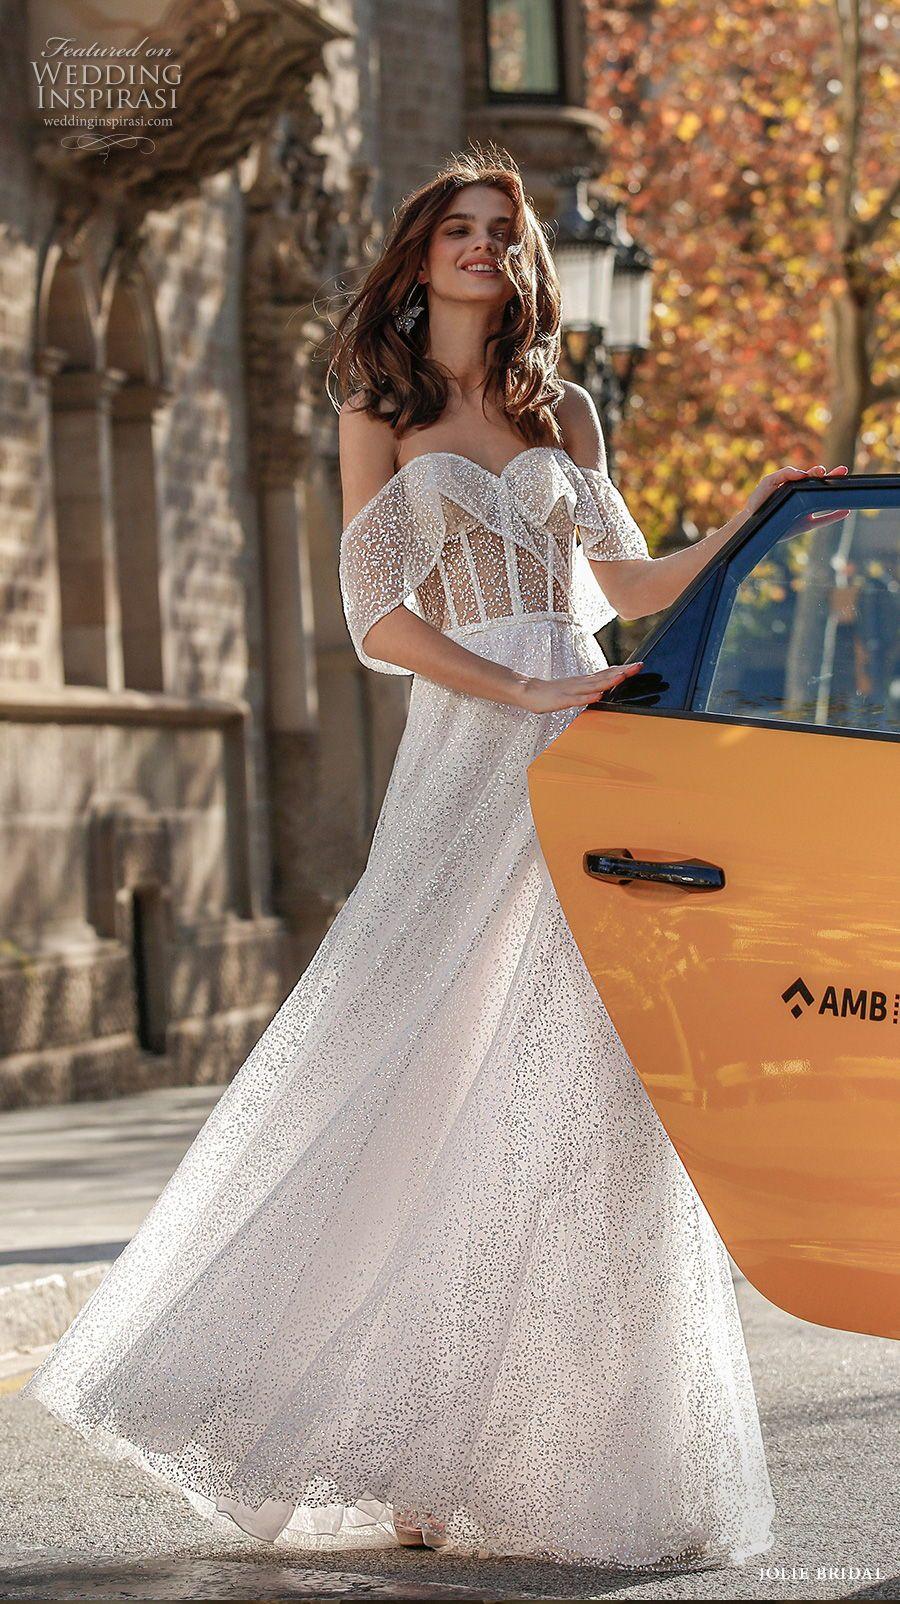 First Look Jolie Bridal Spring 2021 Wedding Dresses Wedding Inspirasi In 2020 Vintage Style Wedding Dresses Wedding Dresses Unique Wedding Dresses,Wedding Party Wear Dresses For Teenage Girls